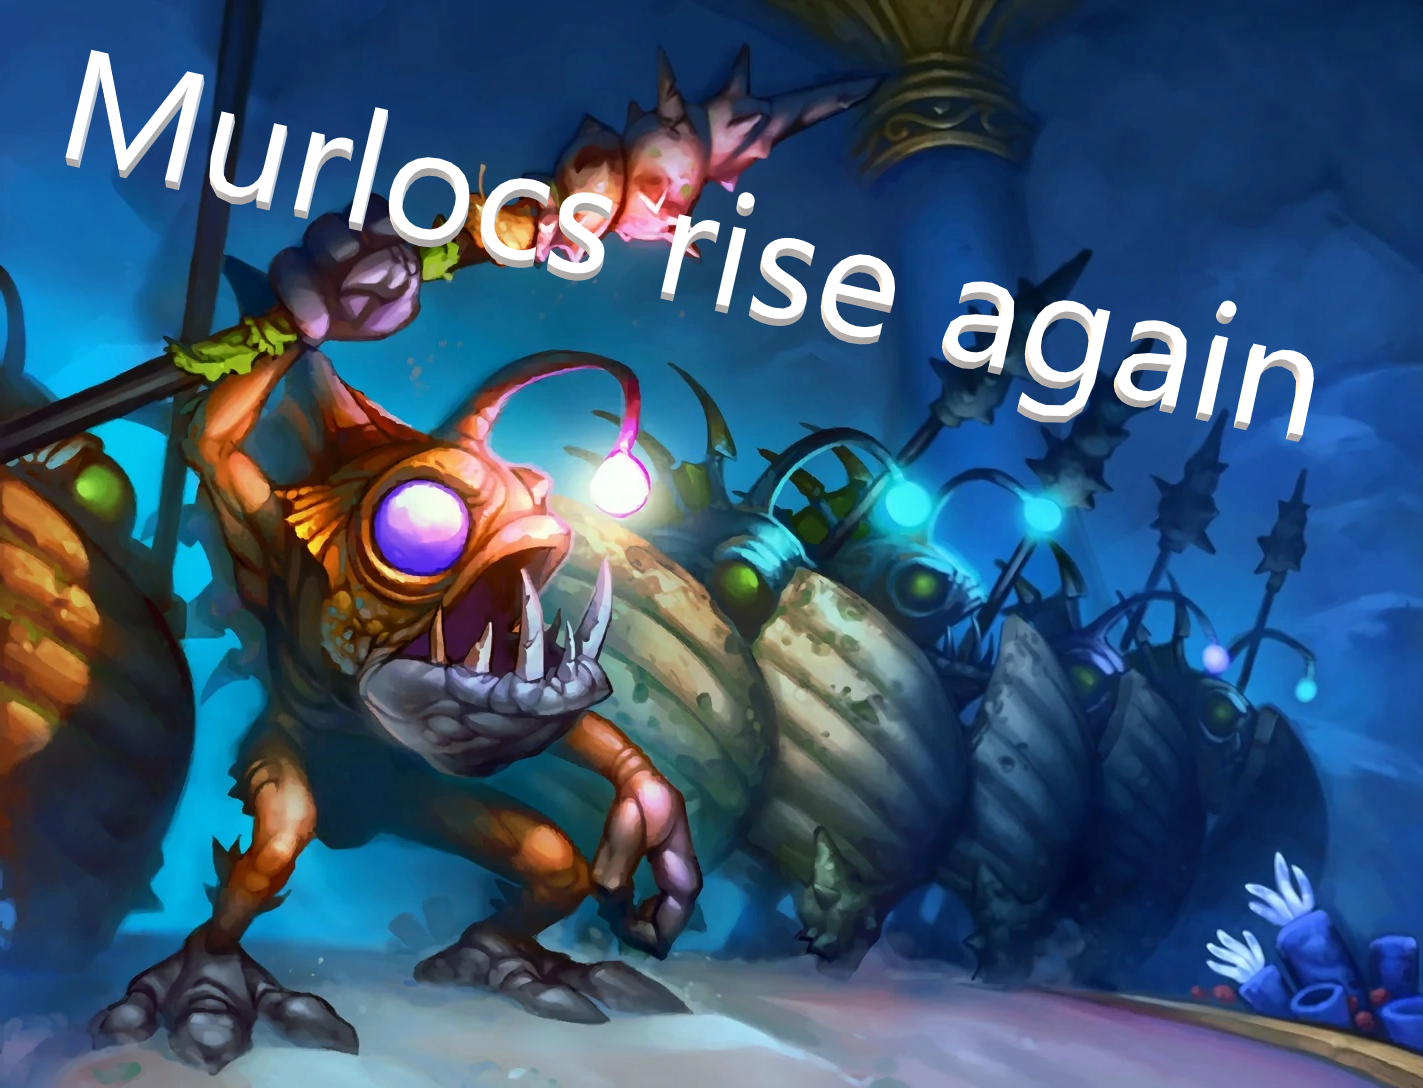 Standard Murloc Paladin Rise Again